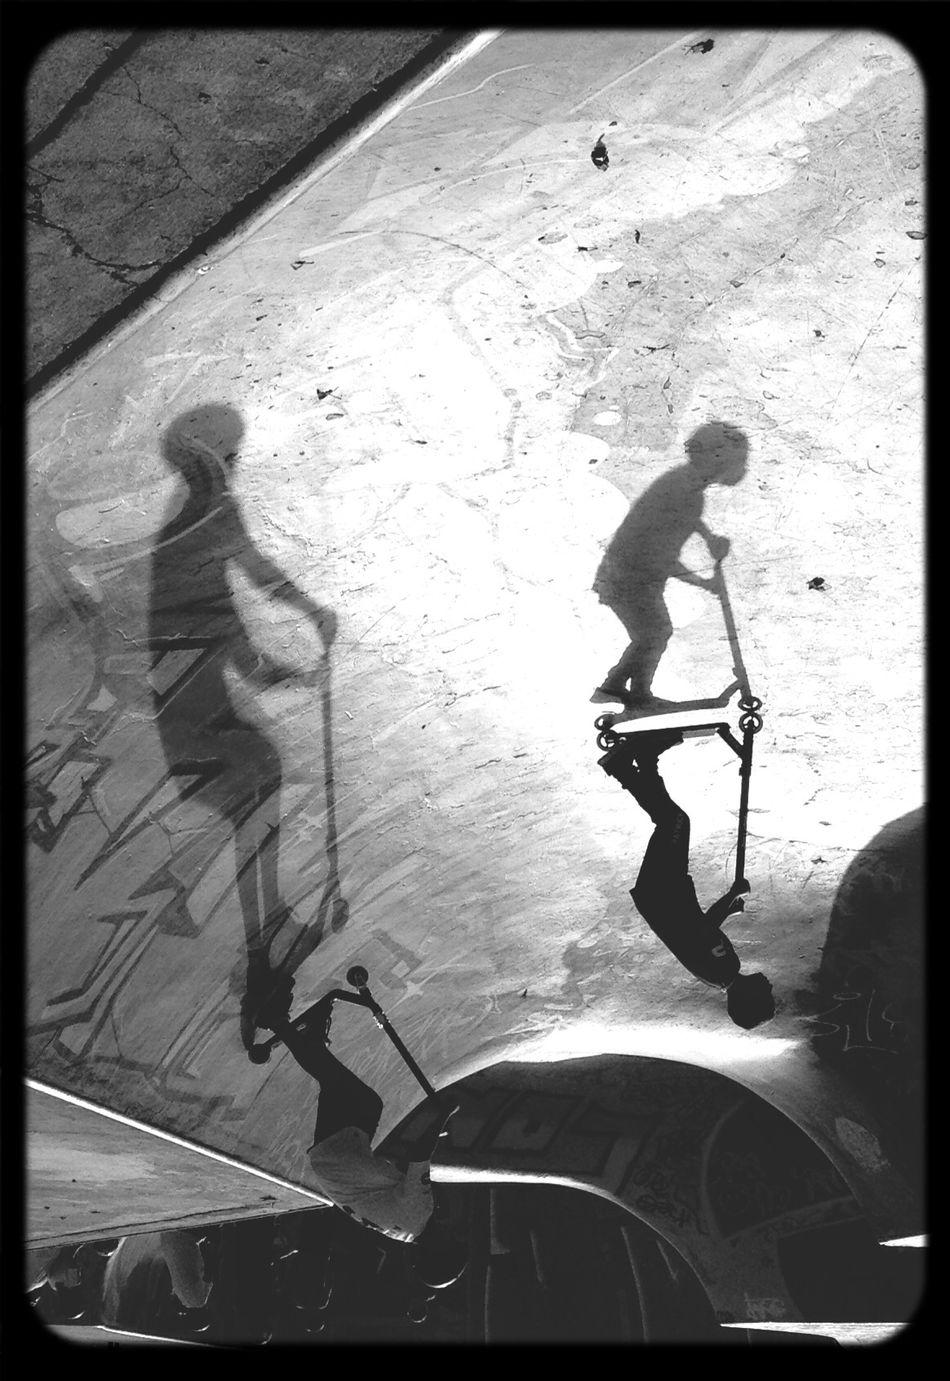 Sport In The City Skateboarding Blackandwhite Monochrome